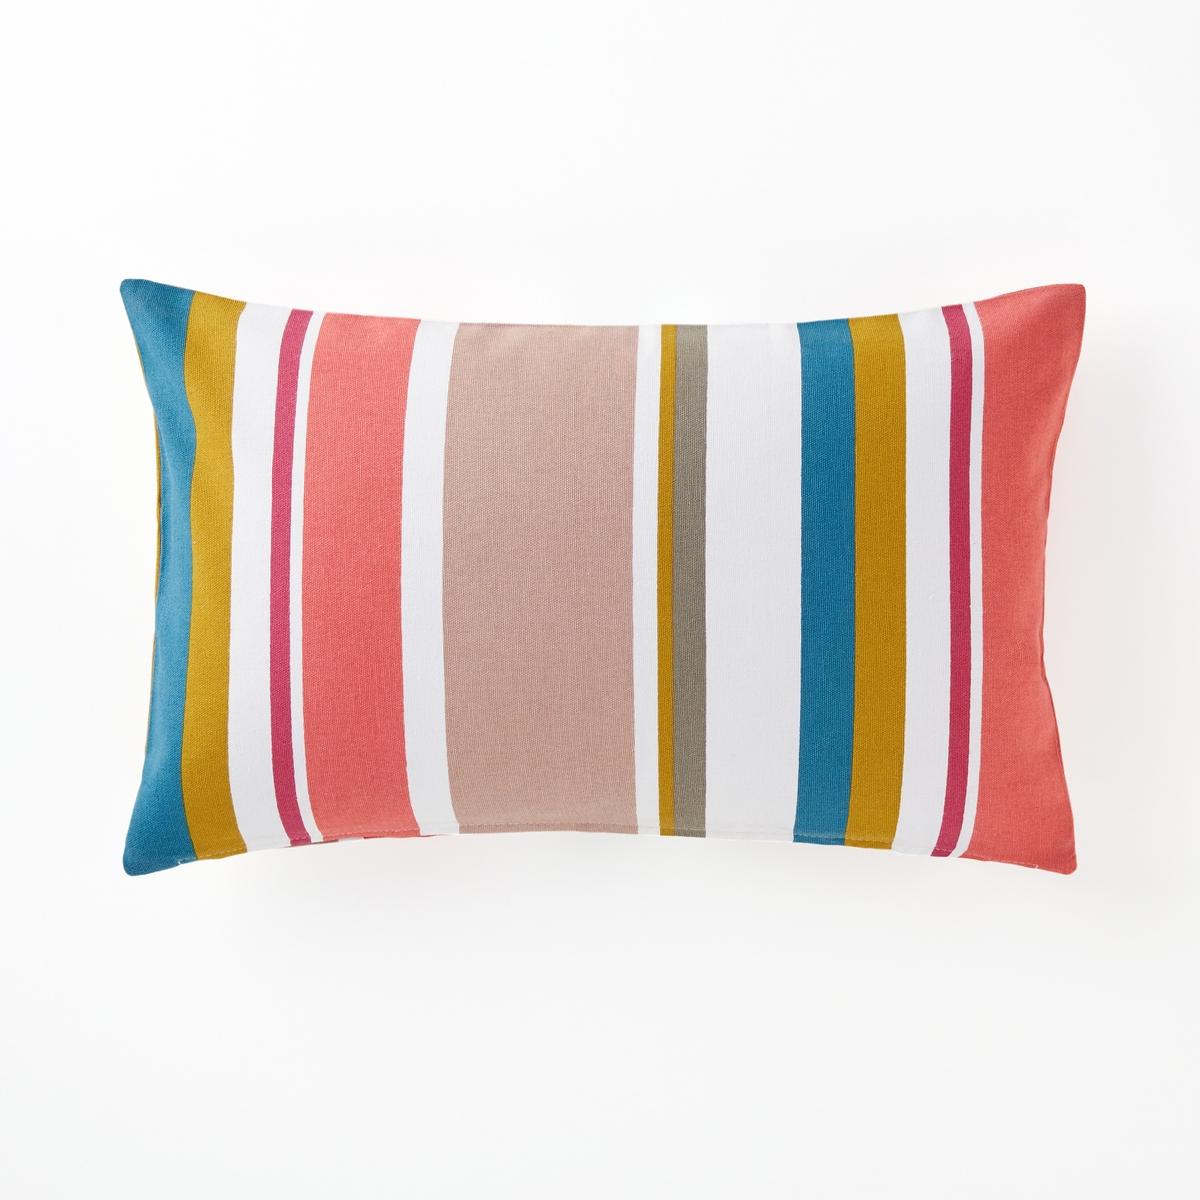 Наволочка на подушку-валик в полоску, Gaillac